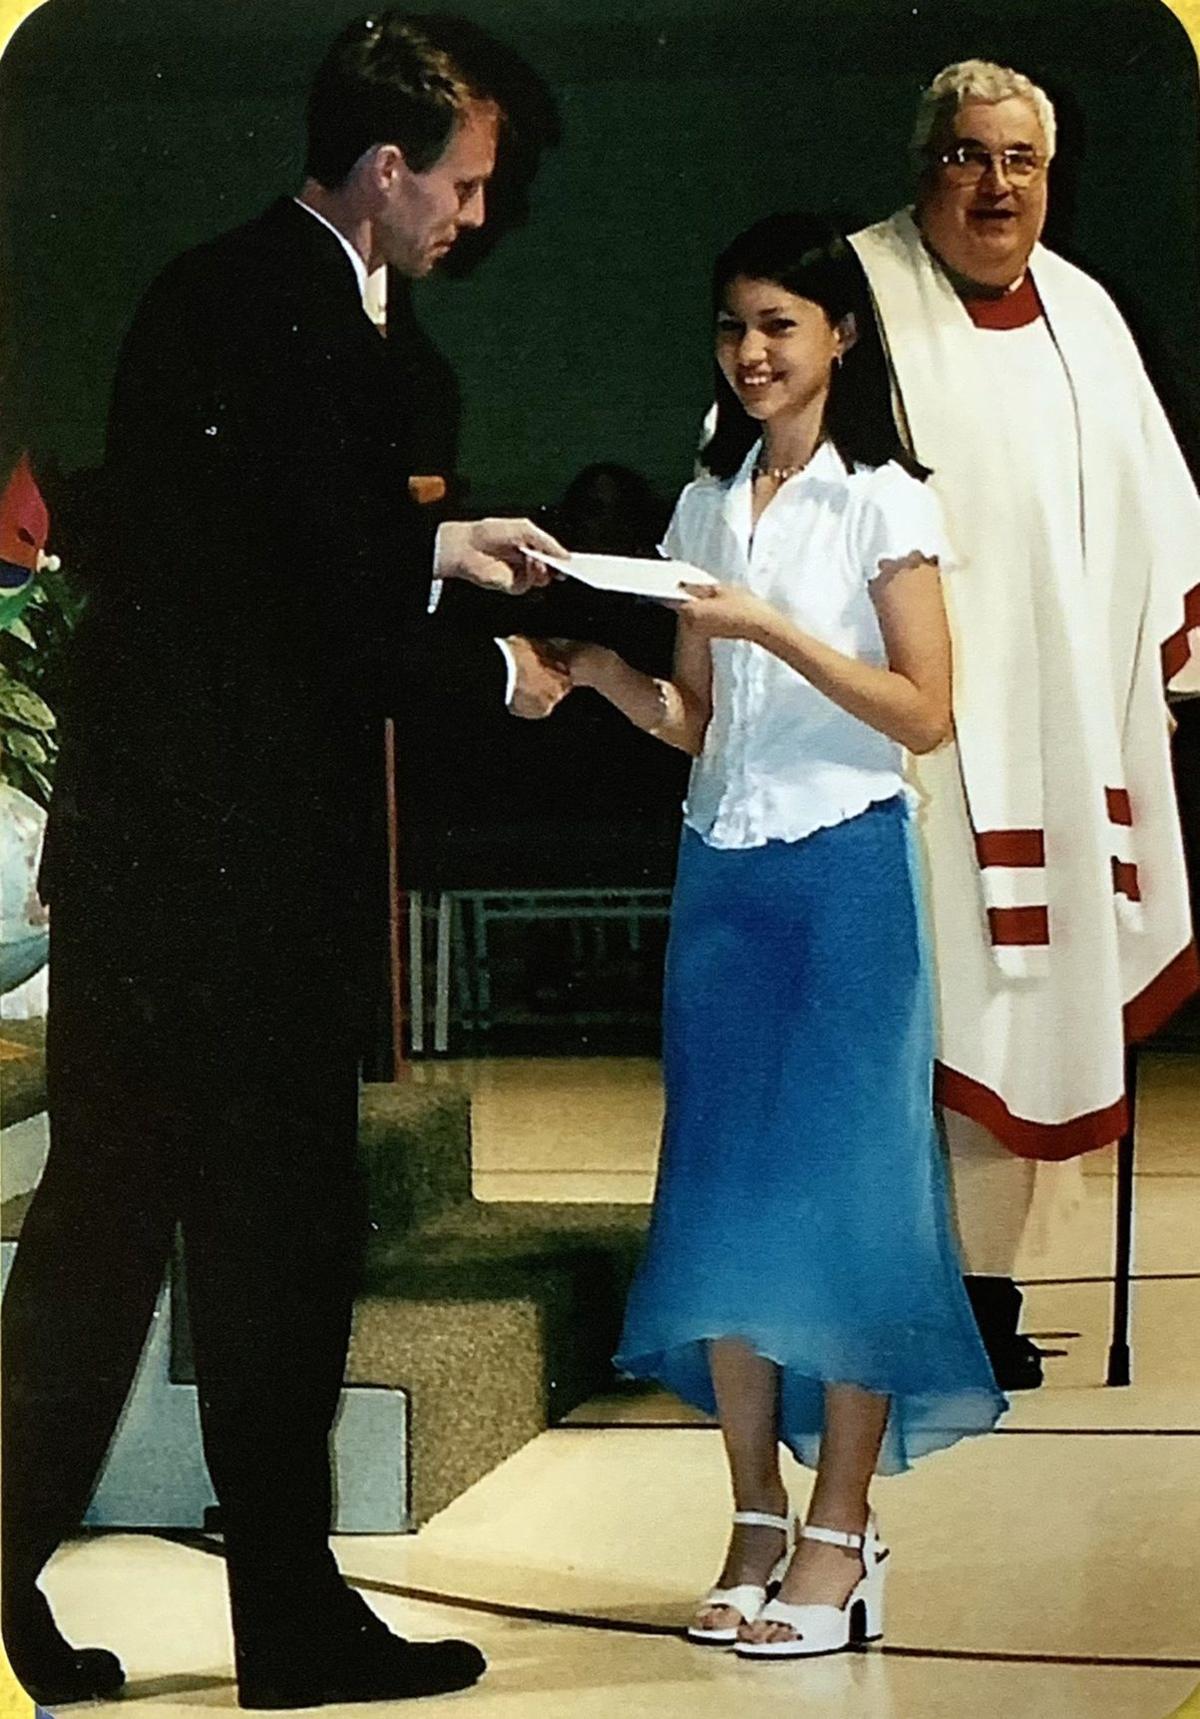 20200129_bl_catholicschools1